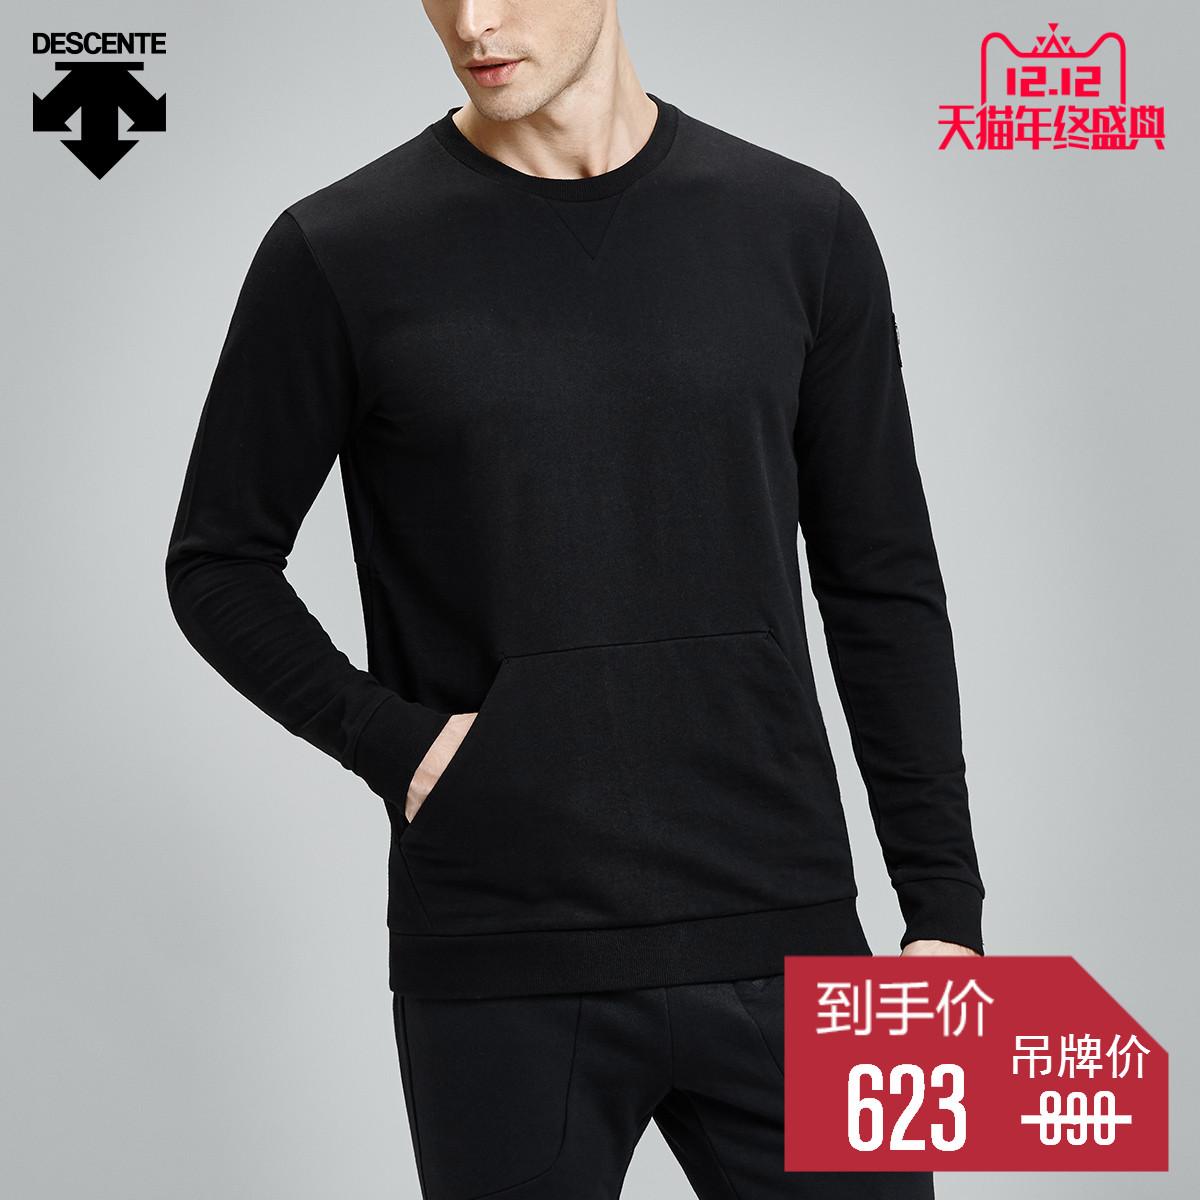 DESCENTE迪桑特男子卫衣 全棉保暖套头卫衣运动长袖T恤D6123DHT30